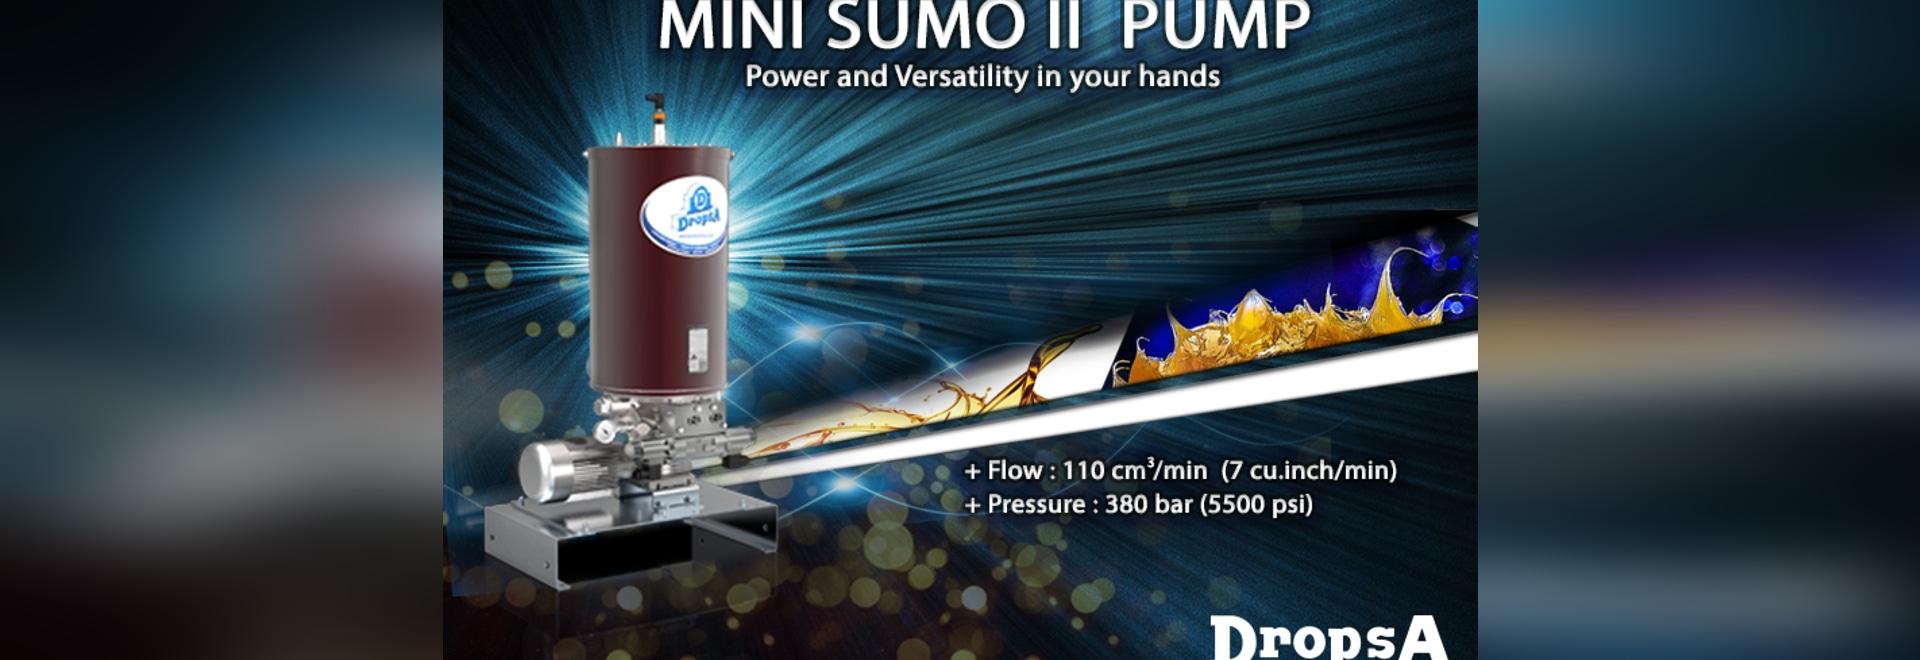 New Mini Sumo II pump